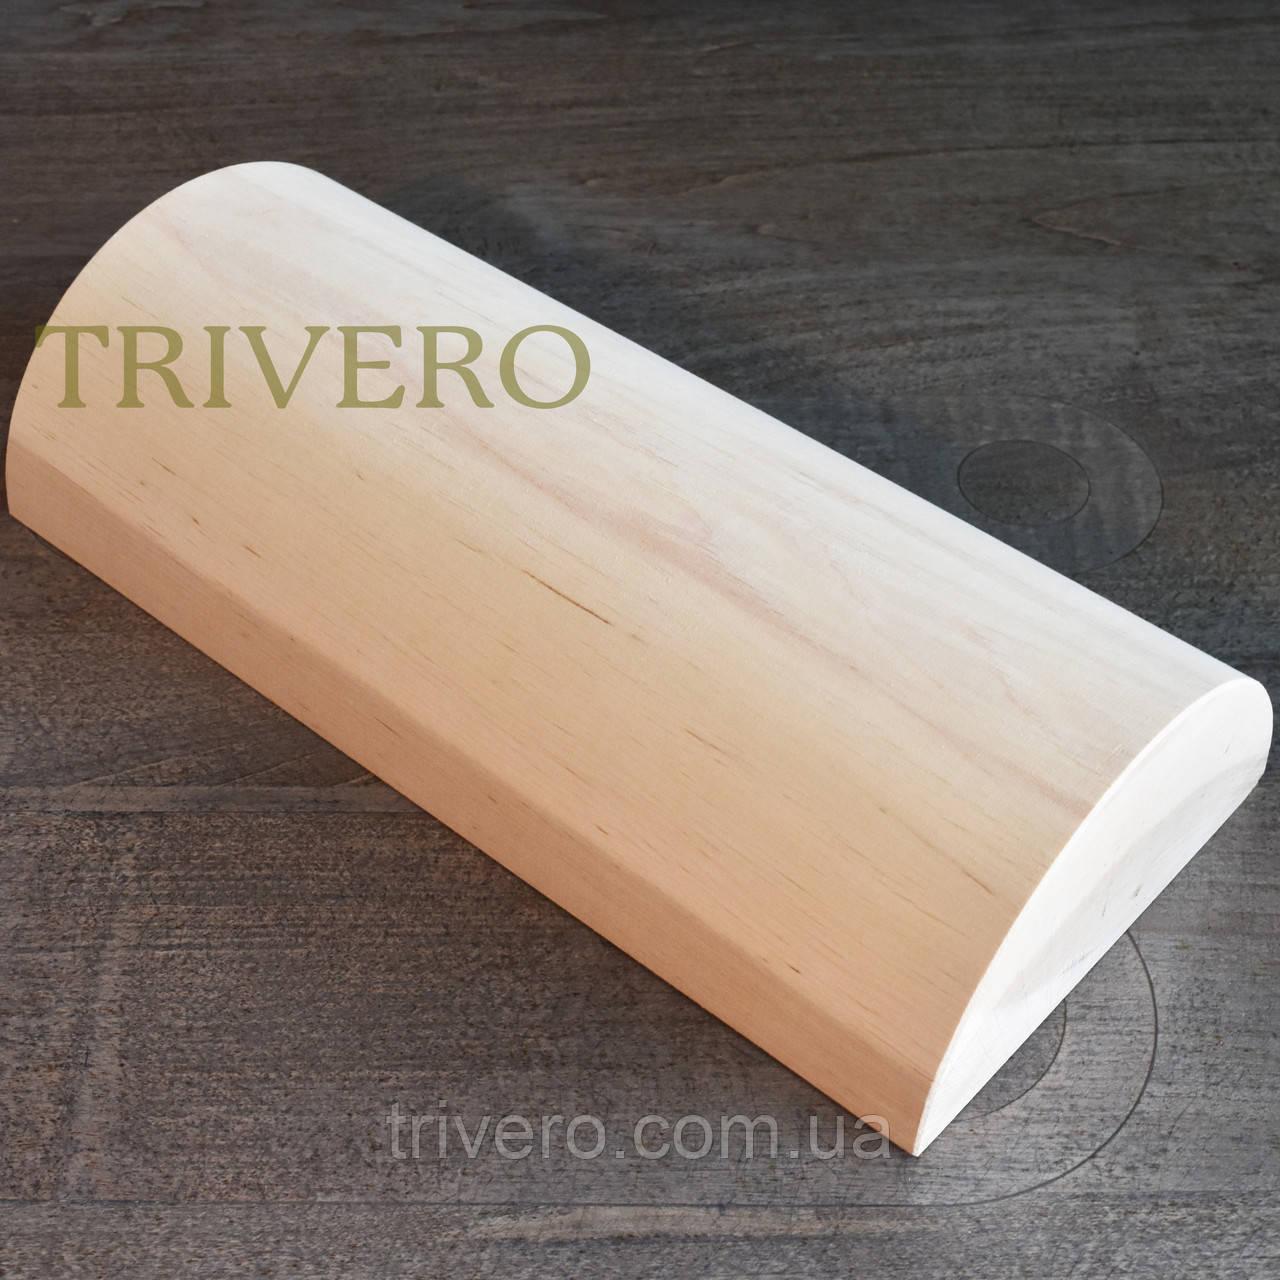 Подушка Ниши - Твердая подушка валик под шею из дерева Покрыта лаком